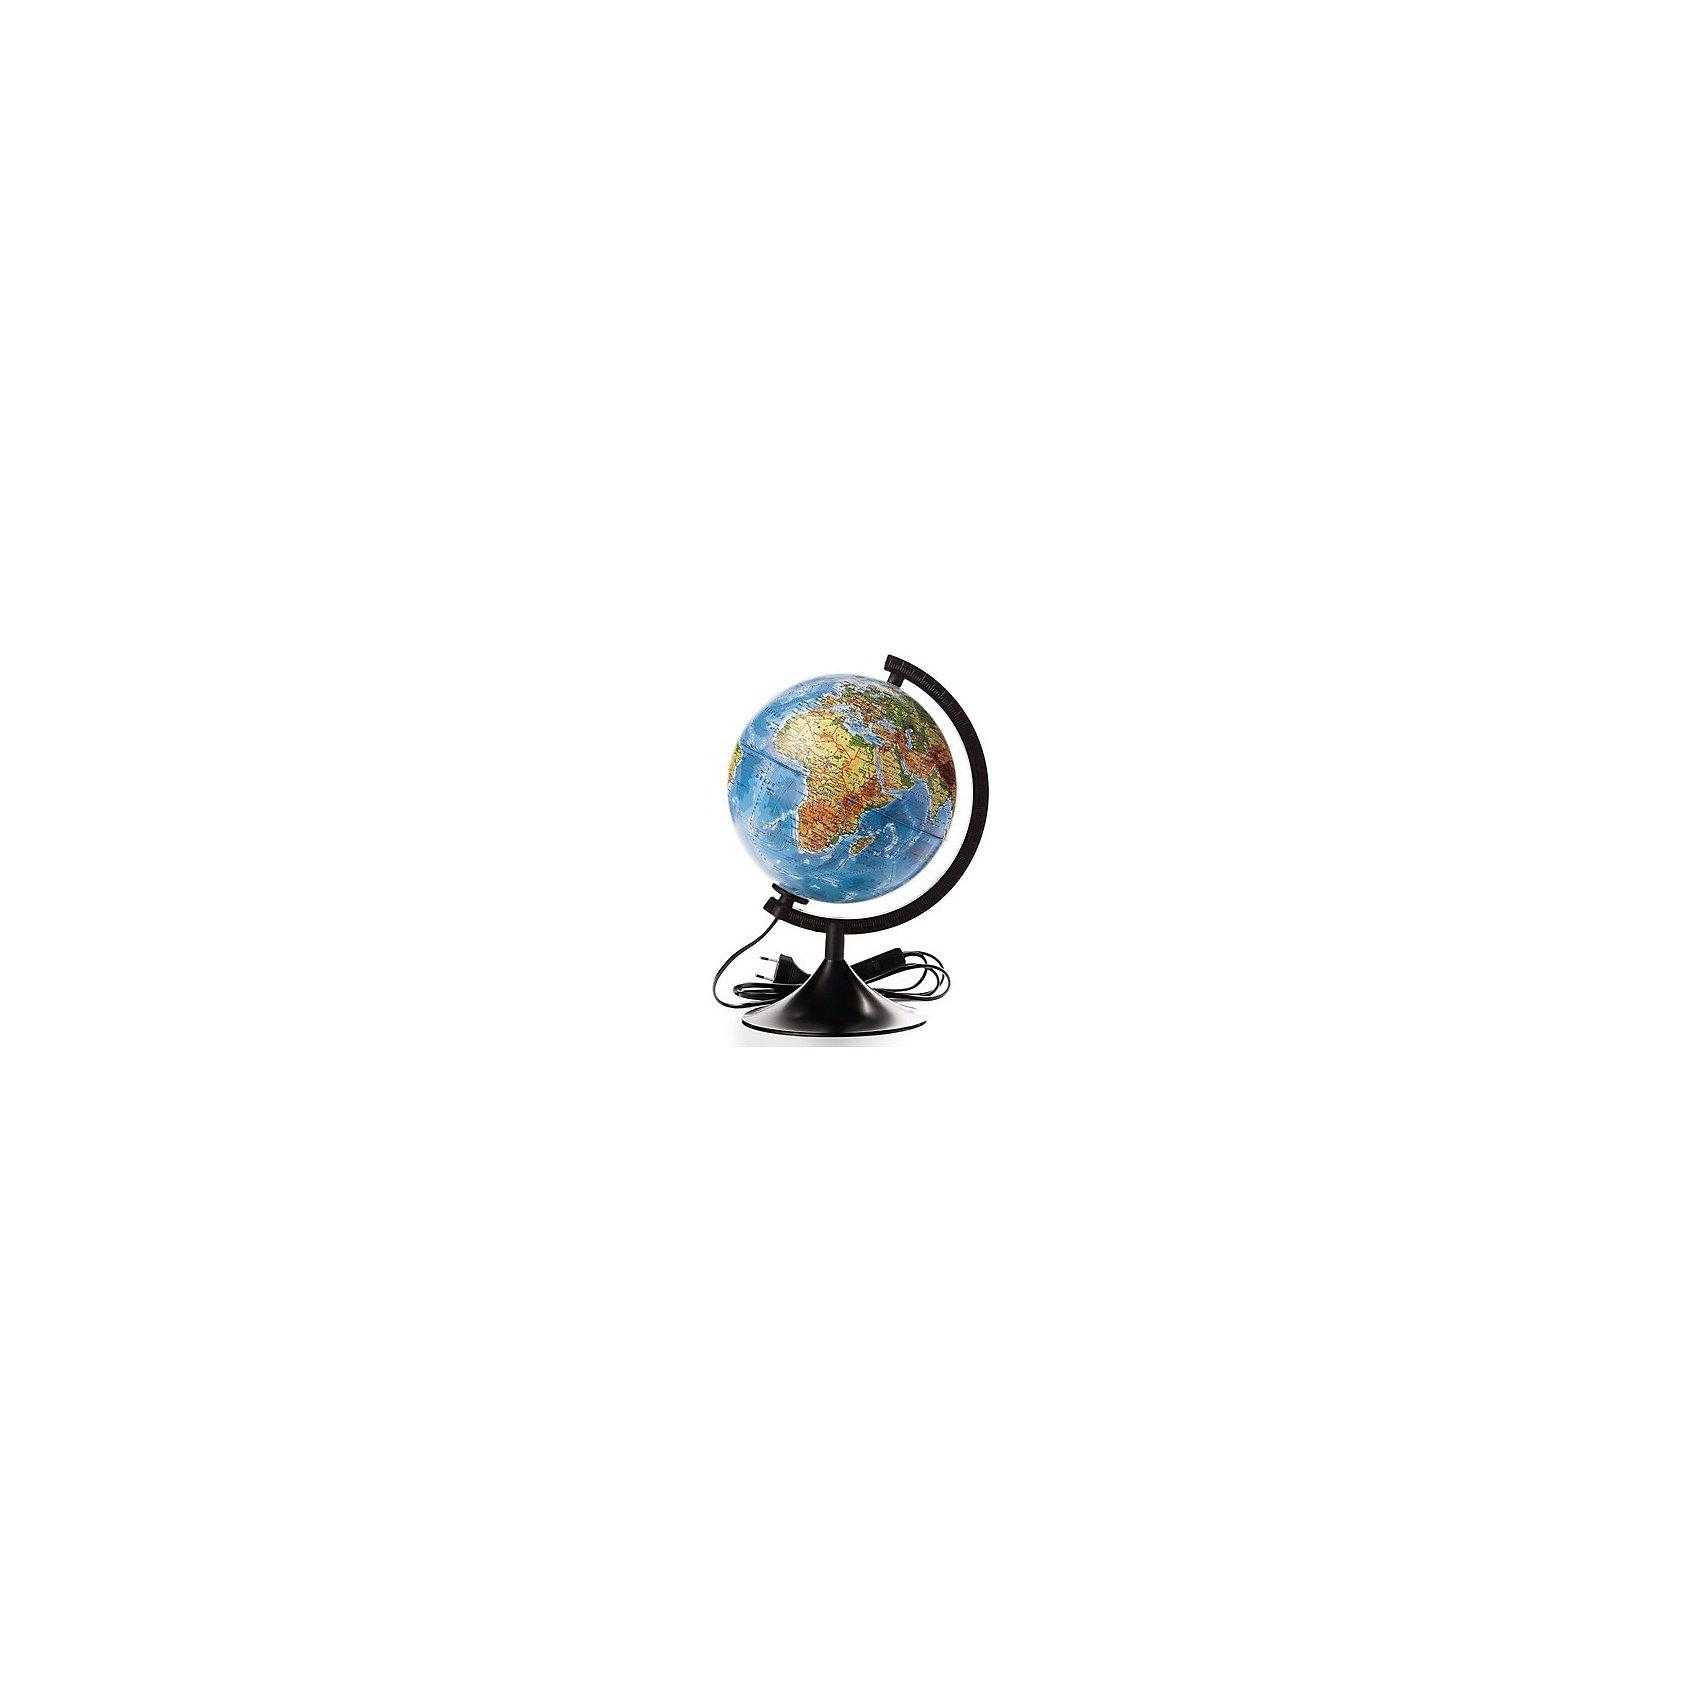 Глобус Земли физический с подсветкой, диаметр 250 ммГлобусы<br>Глобус Земли д-р 250 физический с подсветкой<br><br>Ширина мм: 270<br>Глубина мм: 250<br>Высота мм: 250<br>Вес г: 500<br>Возраст от месяцев: 72<br>Возраст до месяцев: 2147483647<br>Пол: Унисекс<br>Возраст: Детский<br>SKU: 5504470